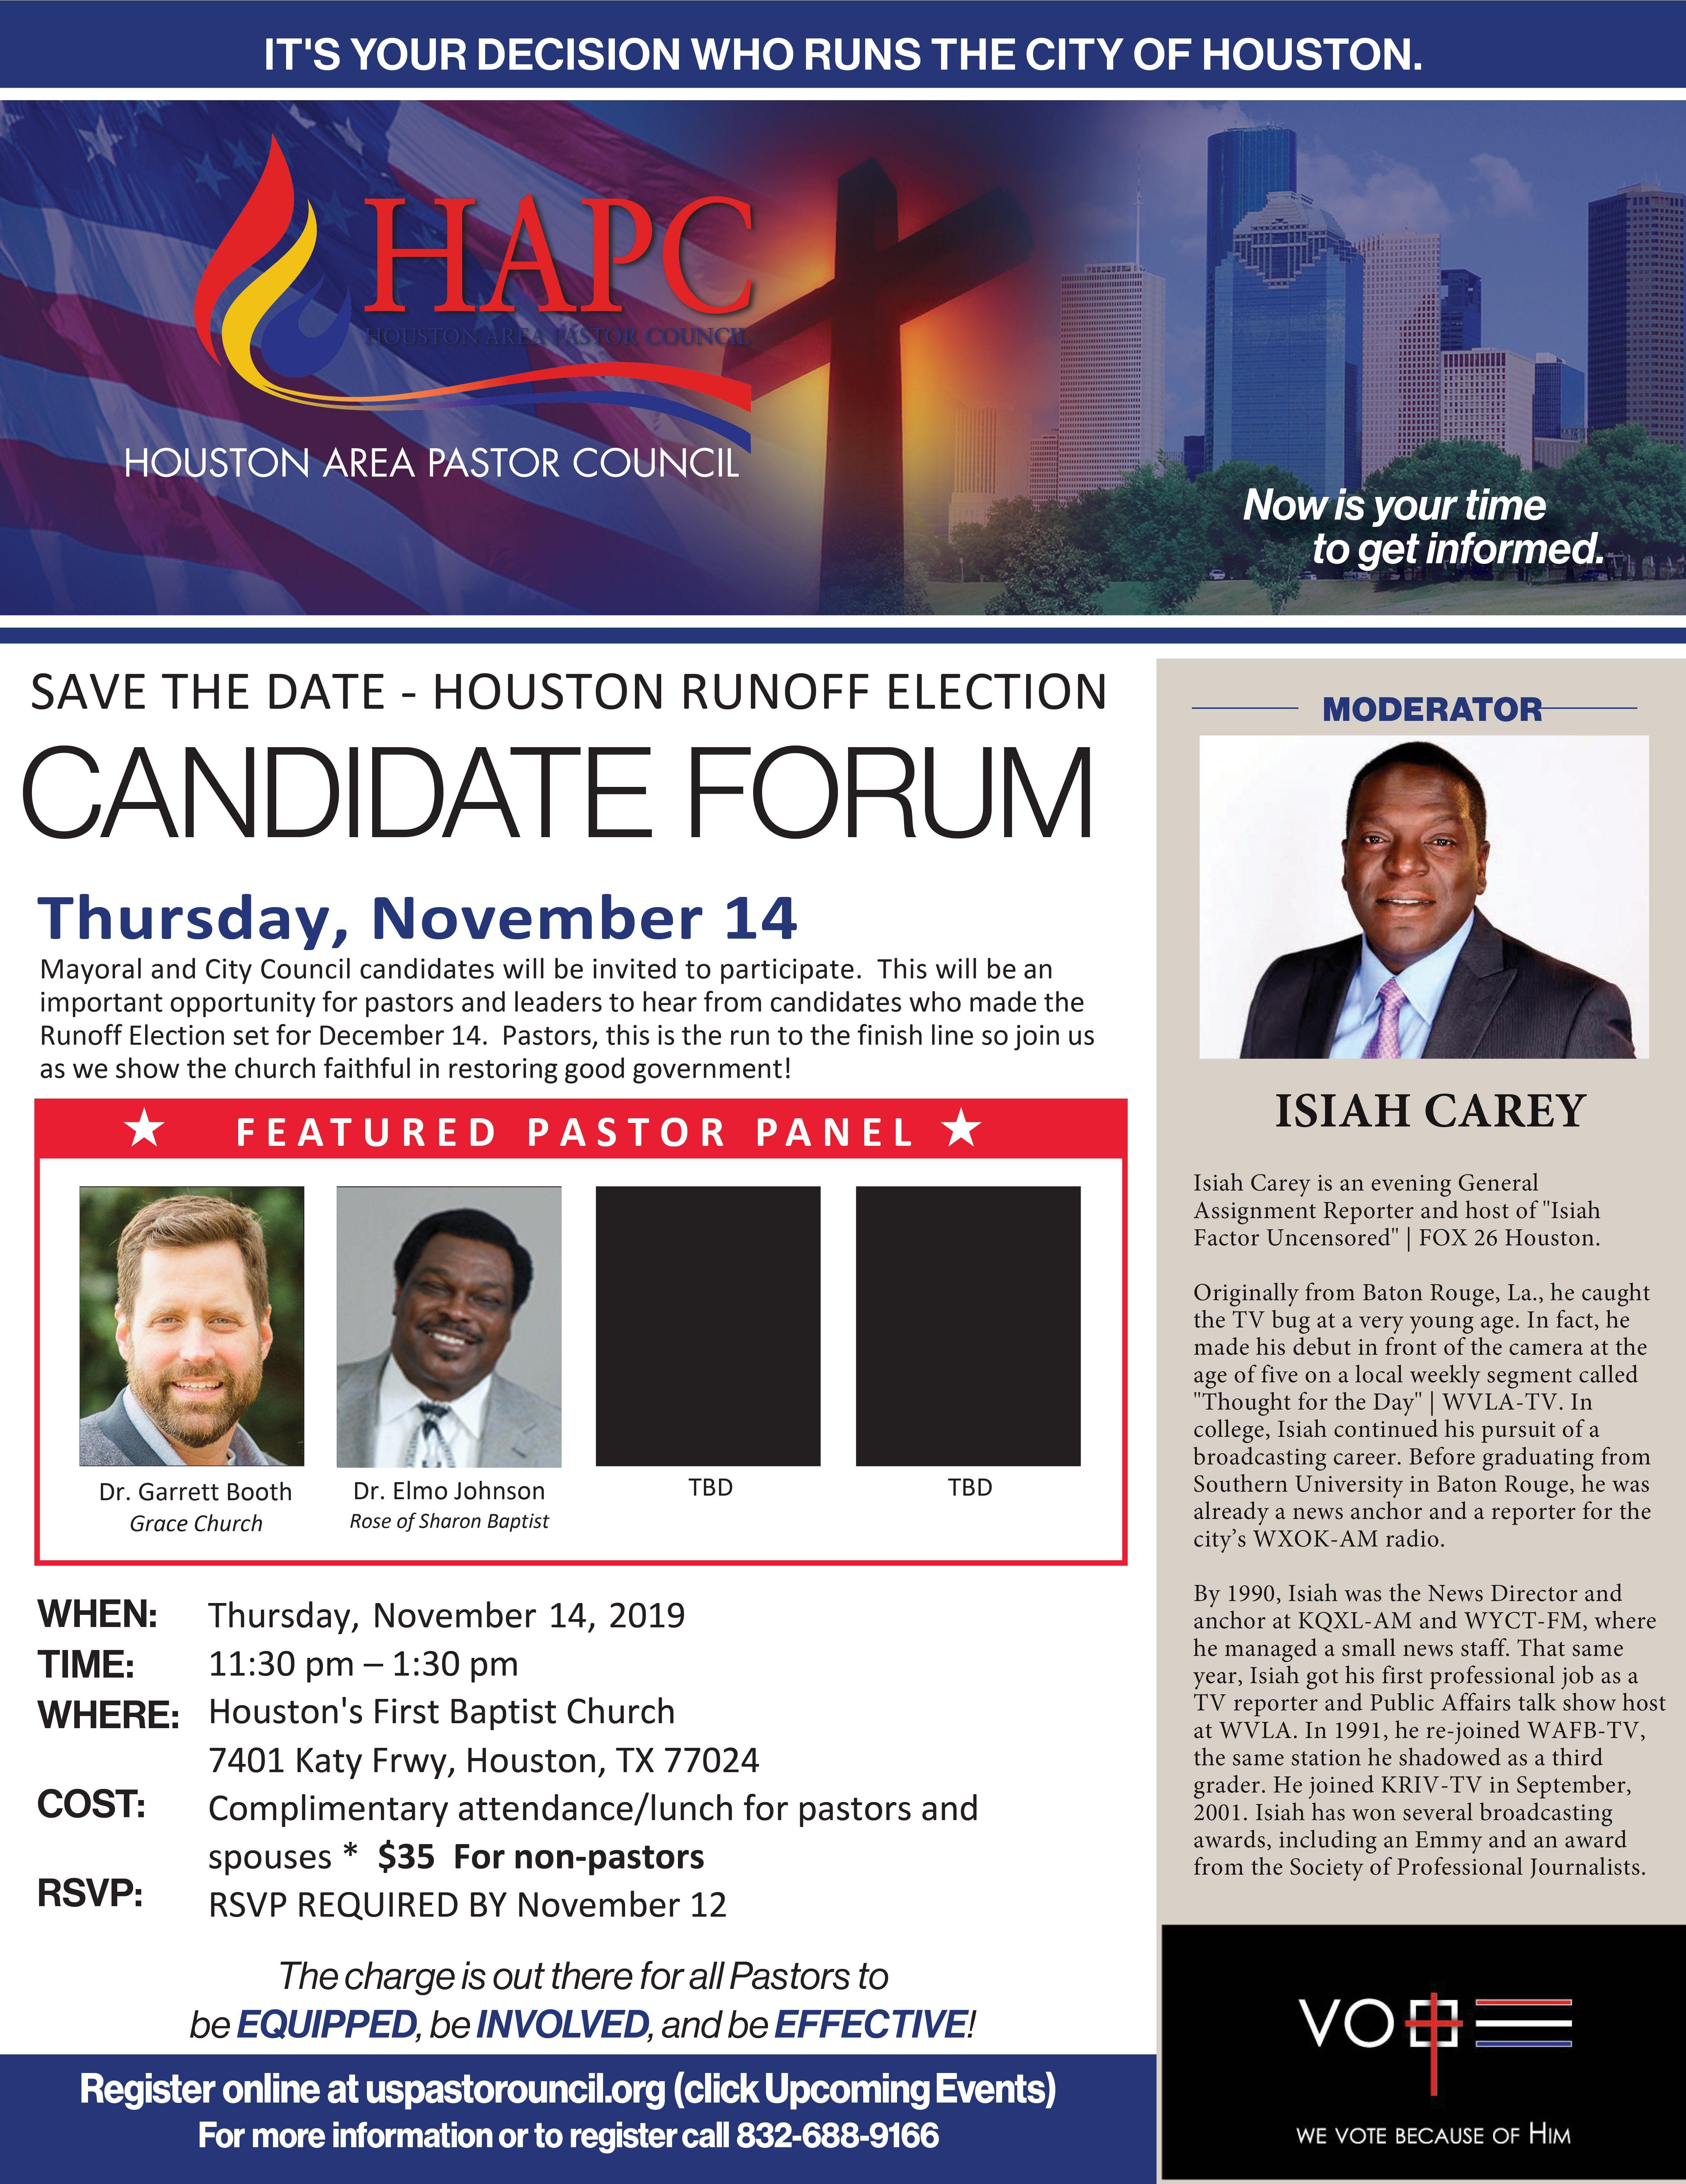 2019 Houston Runoff Candidate Forum